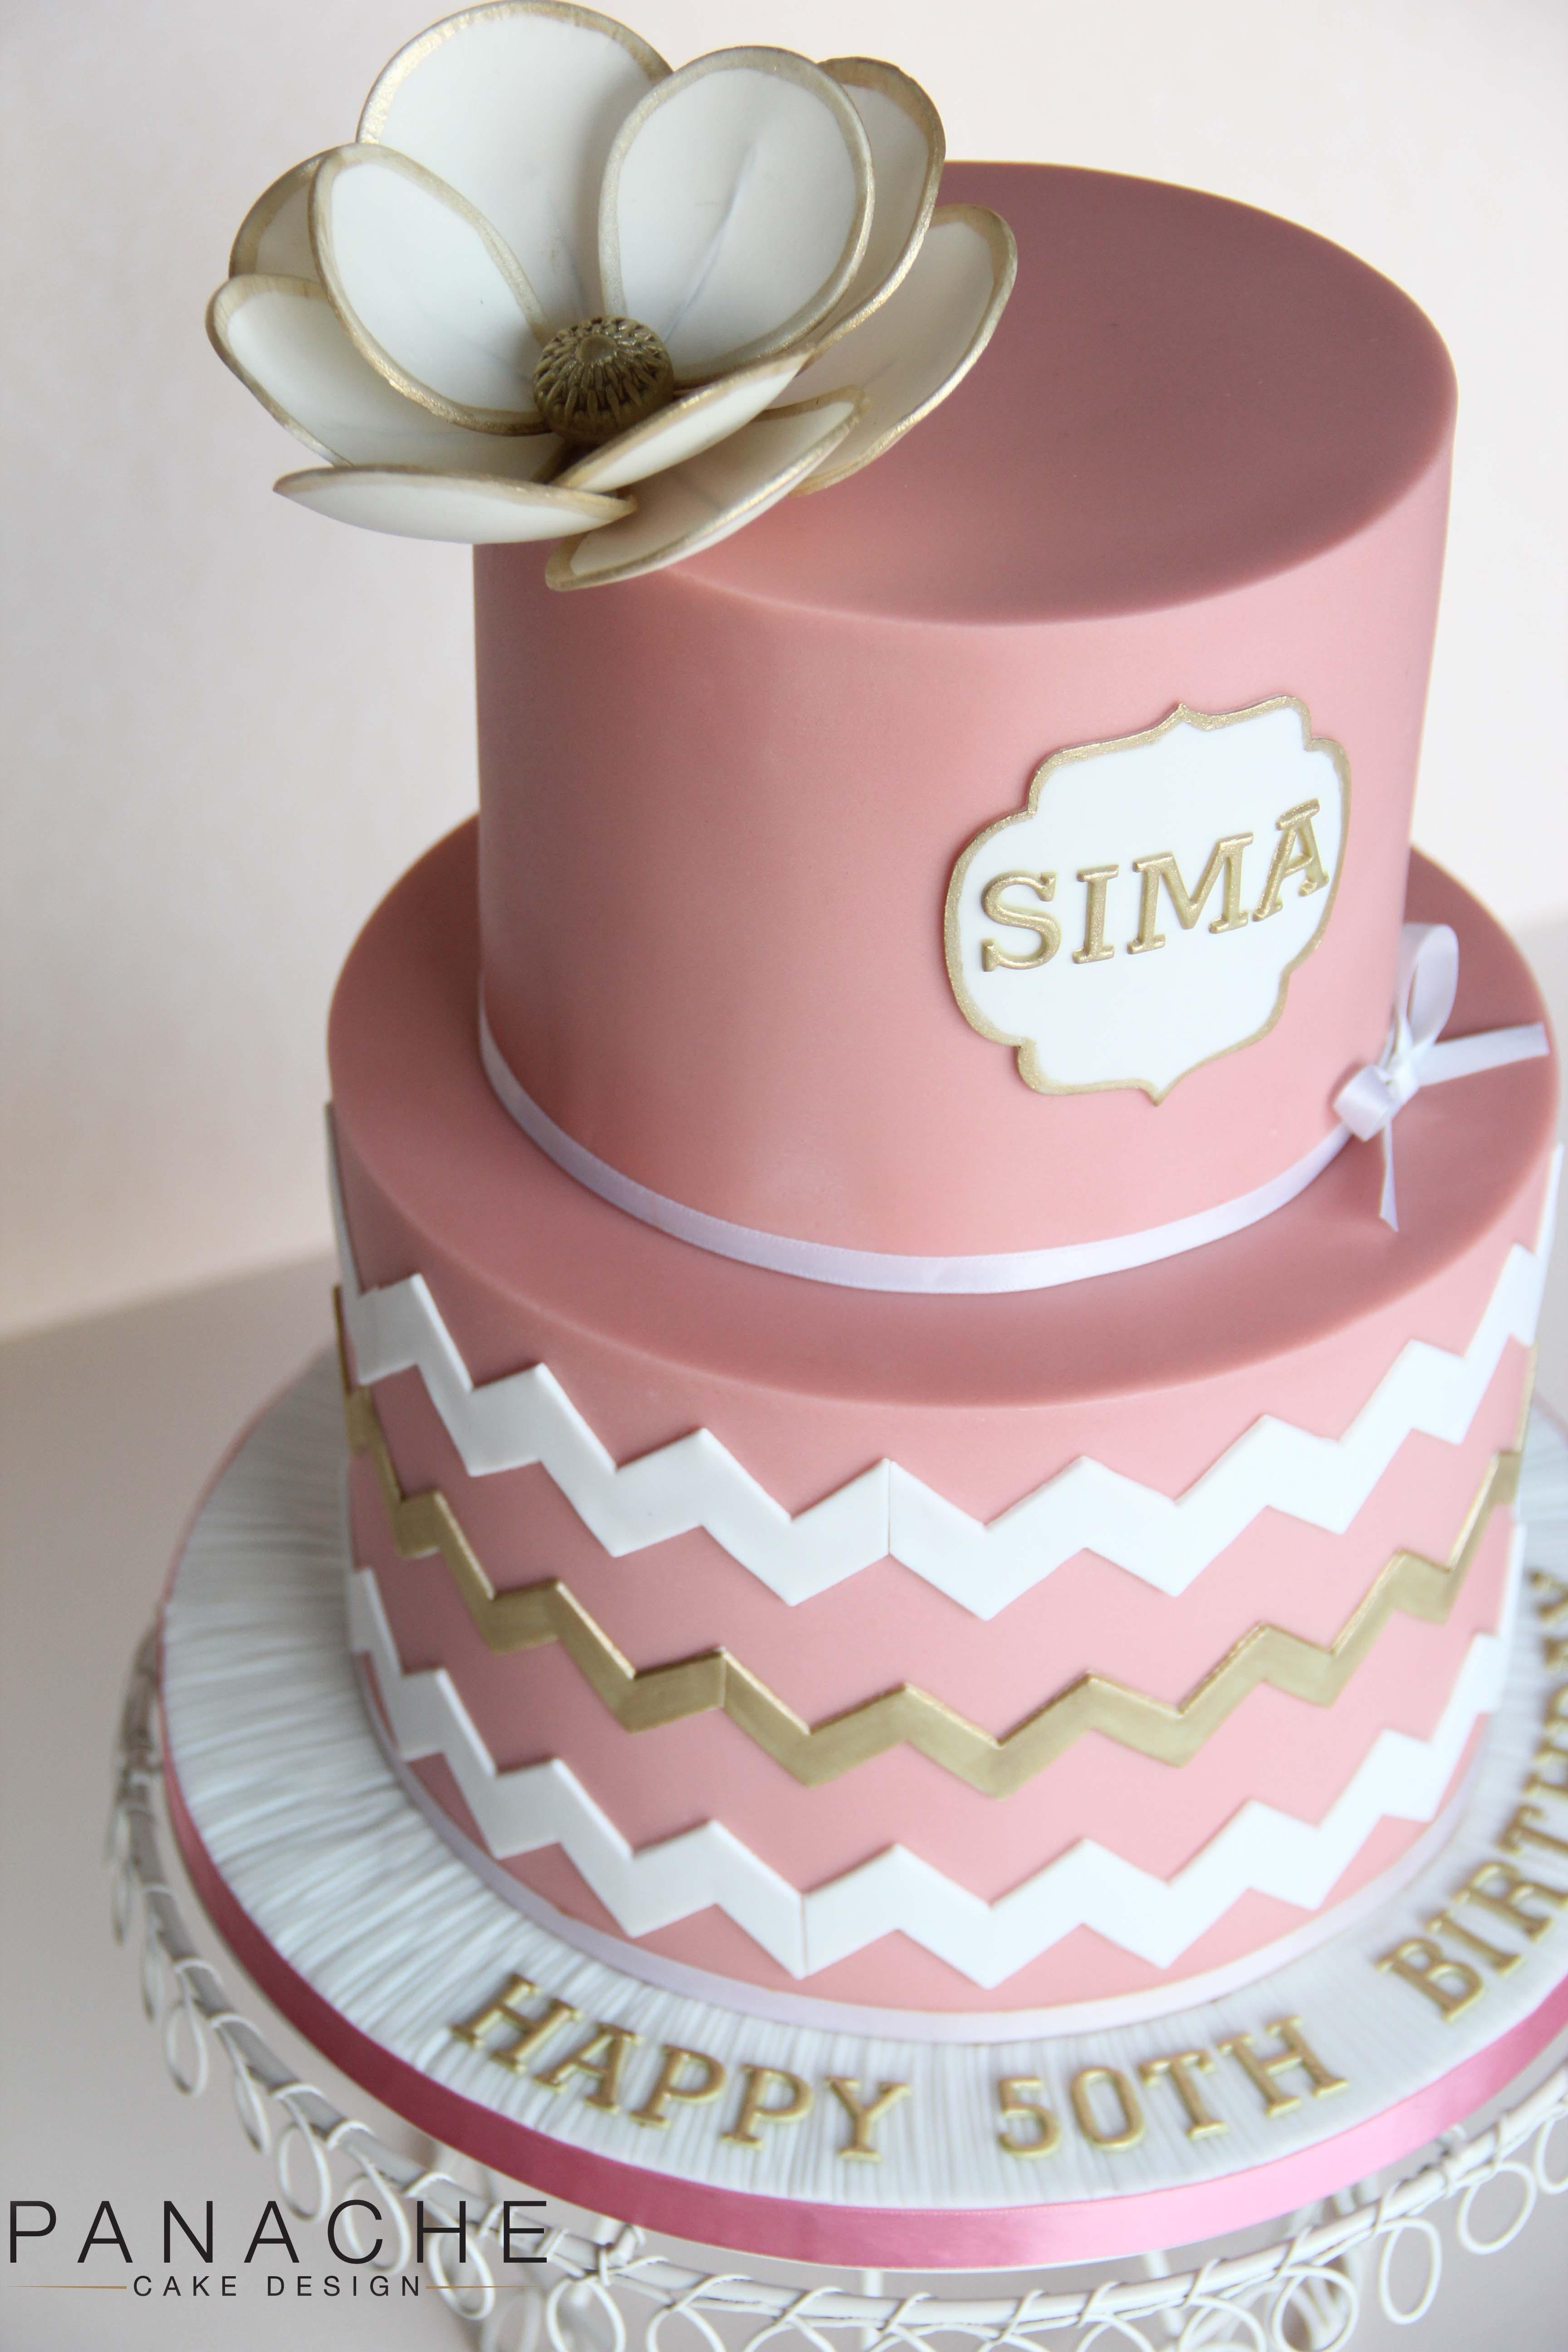 Pink And Gold Elegant Birthday Cakes Photo Jpg 3456x5184 Women 50th Cake